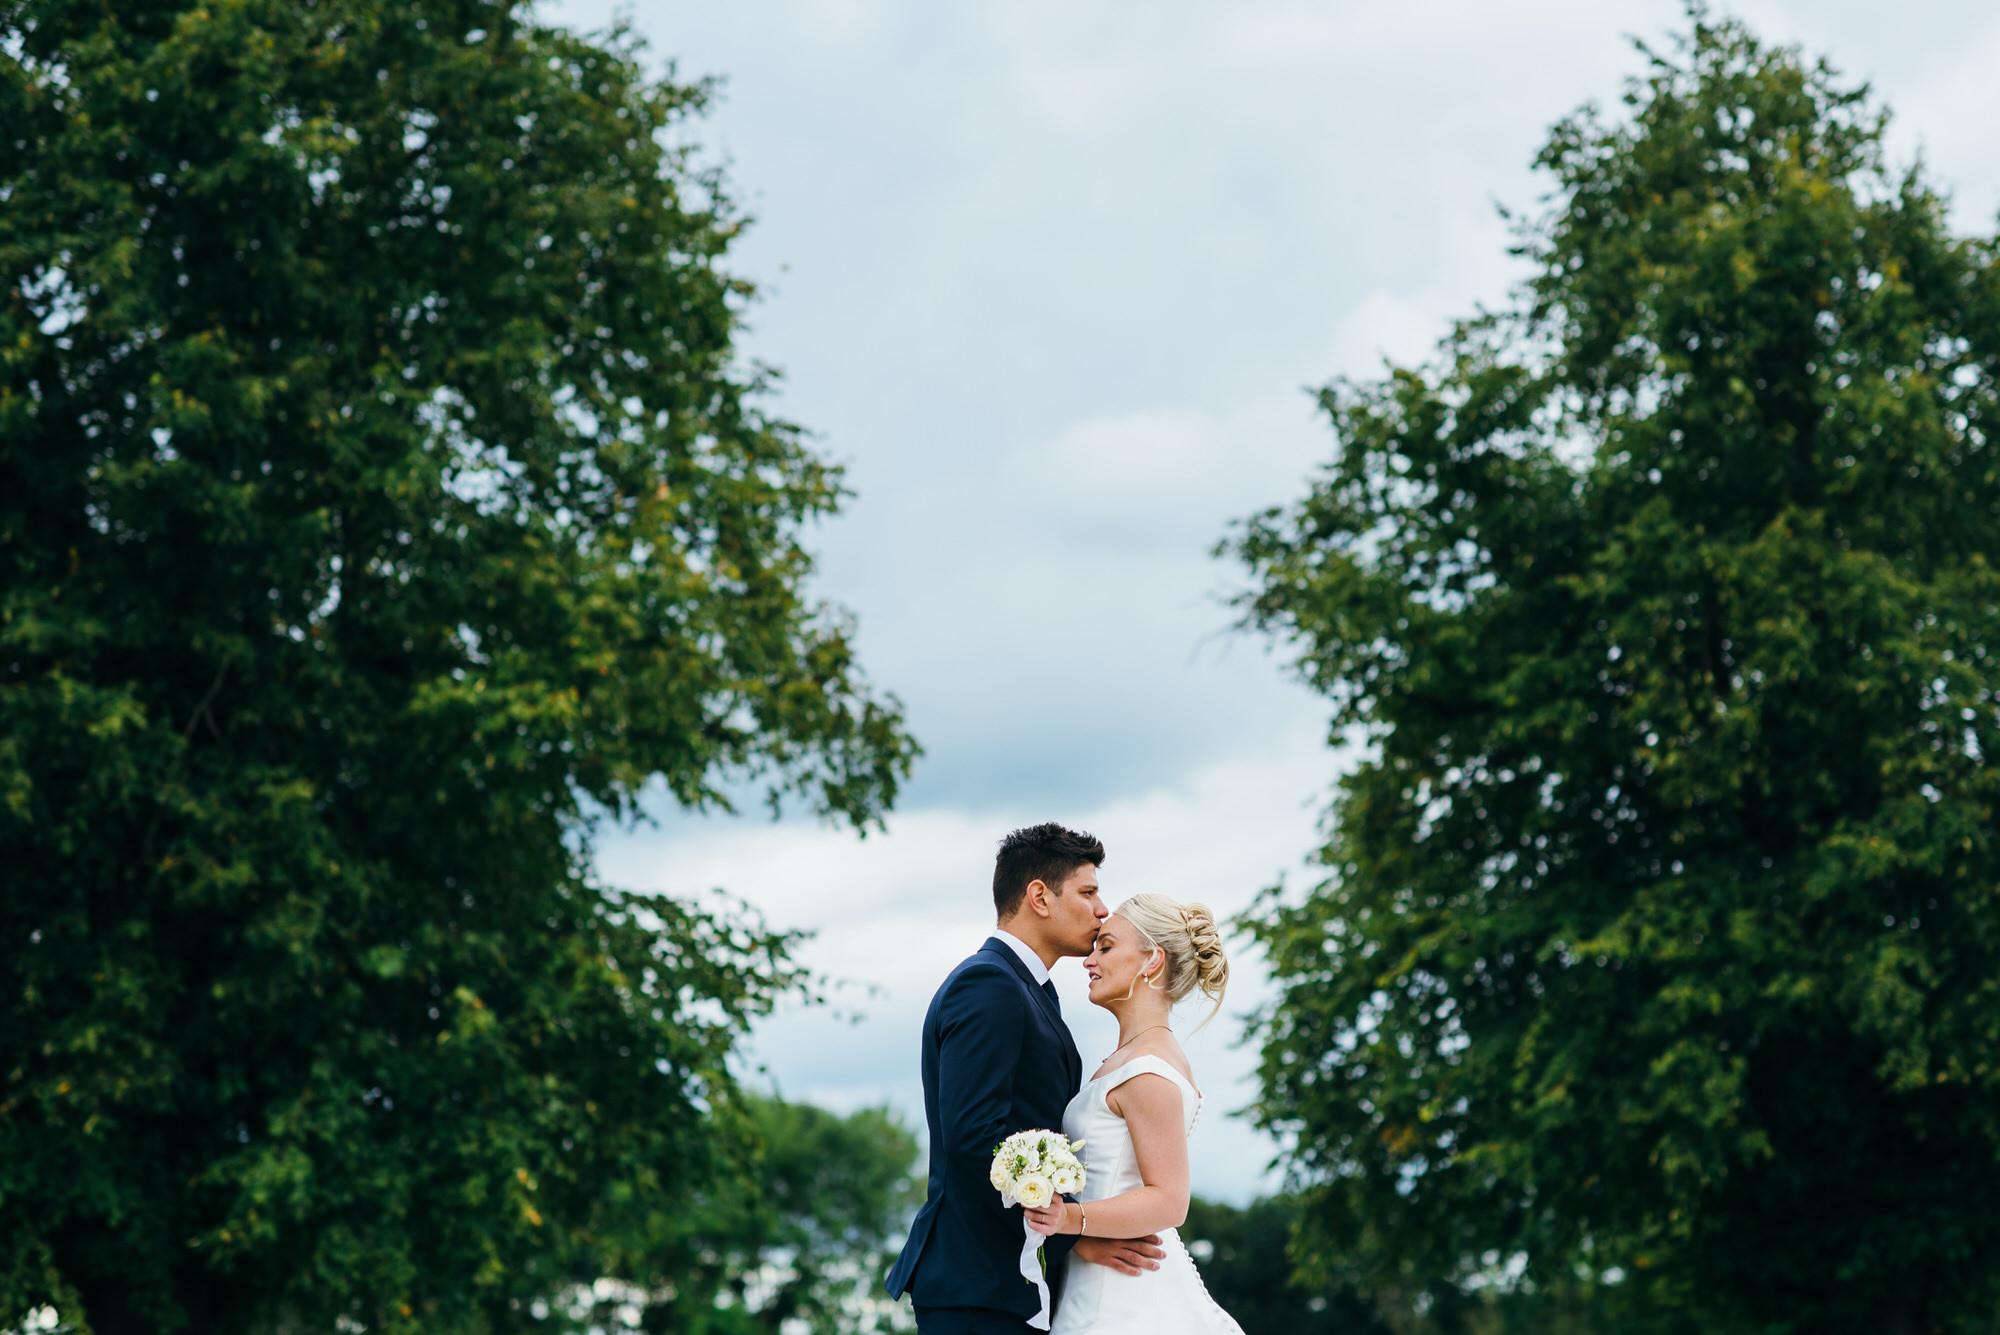 Merrydale manor wedding photography 071